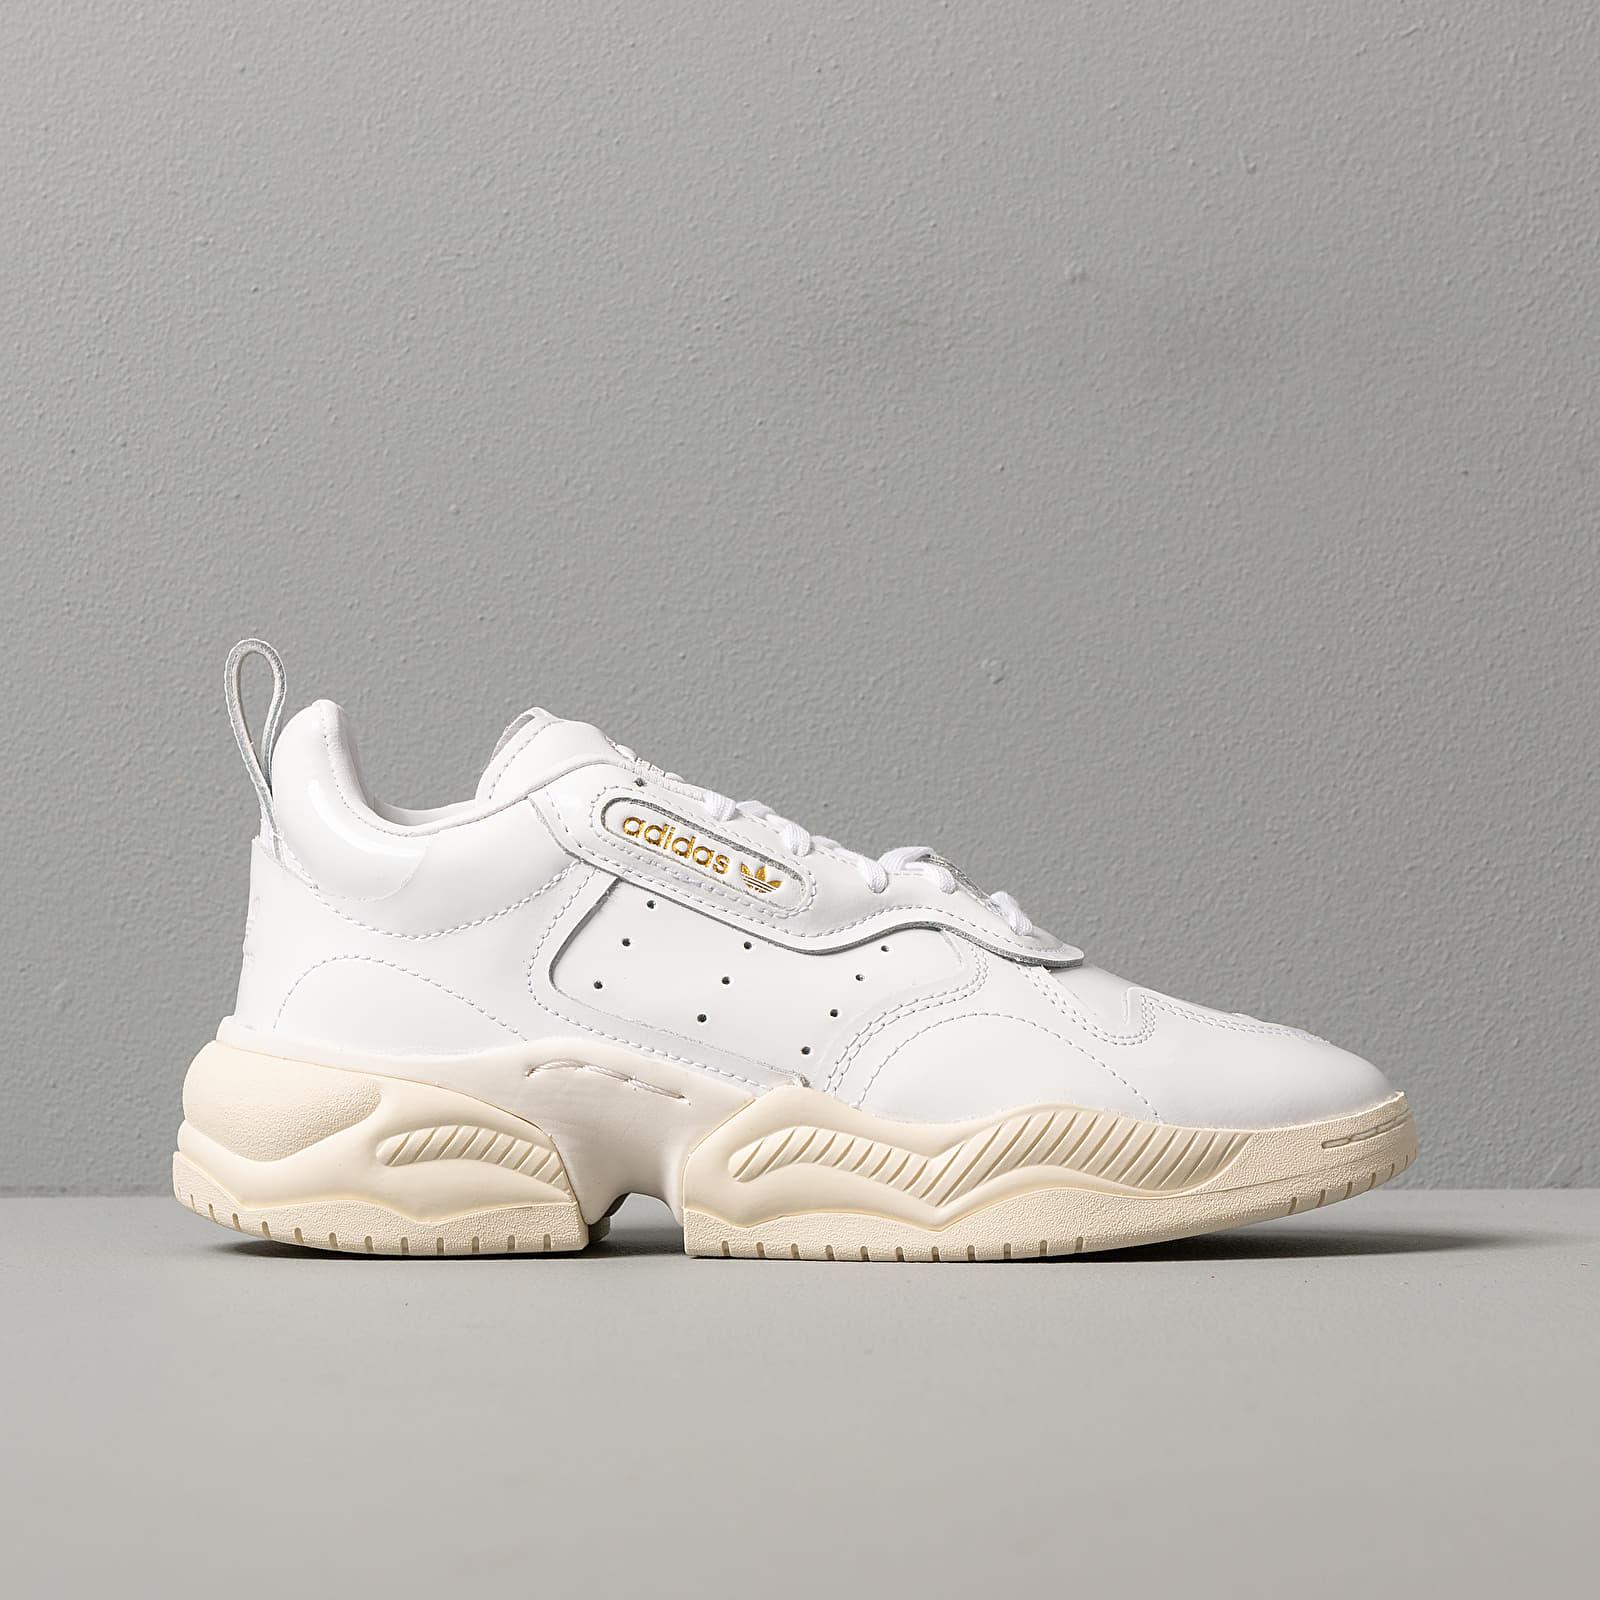 adidas Supercourt RX WFtw White Ftw White Off White